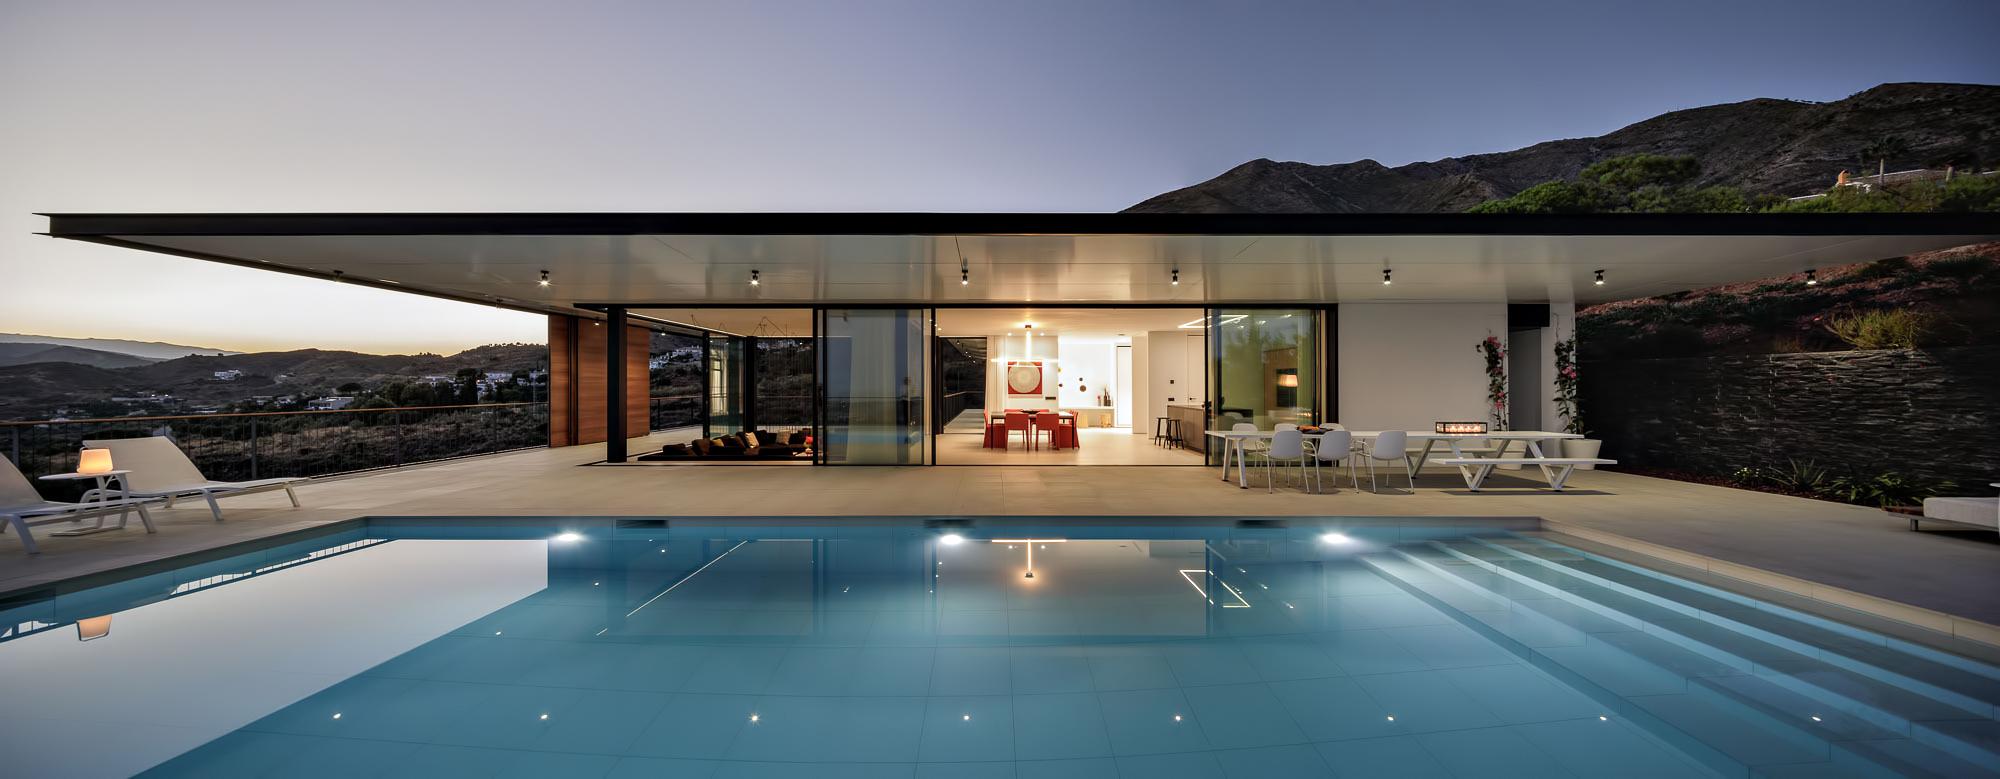 Villa K Luxury Residence - Mijas, Spain